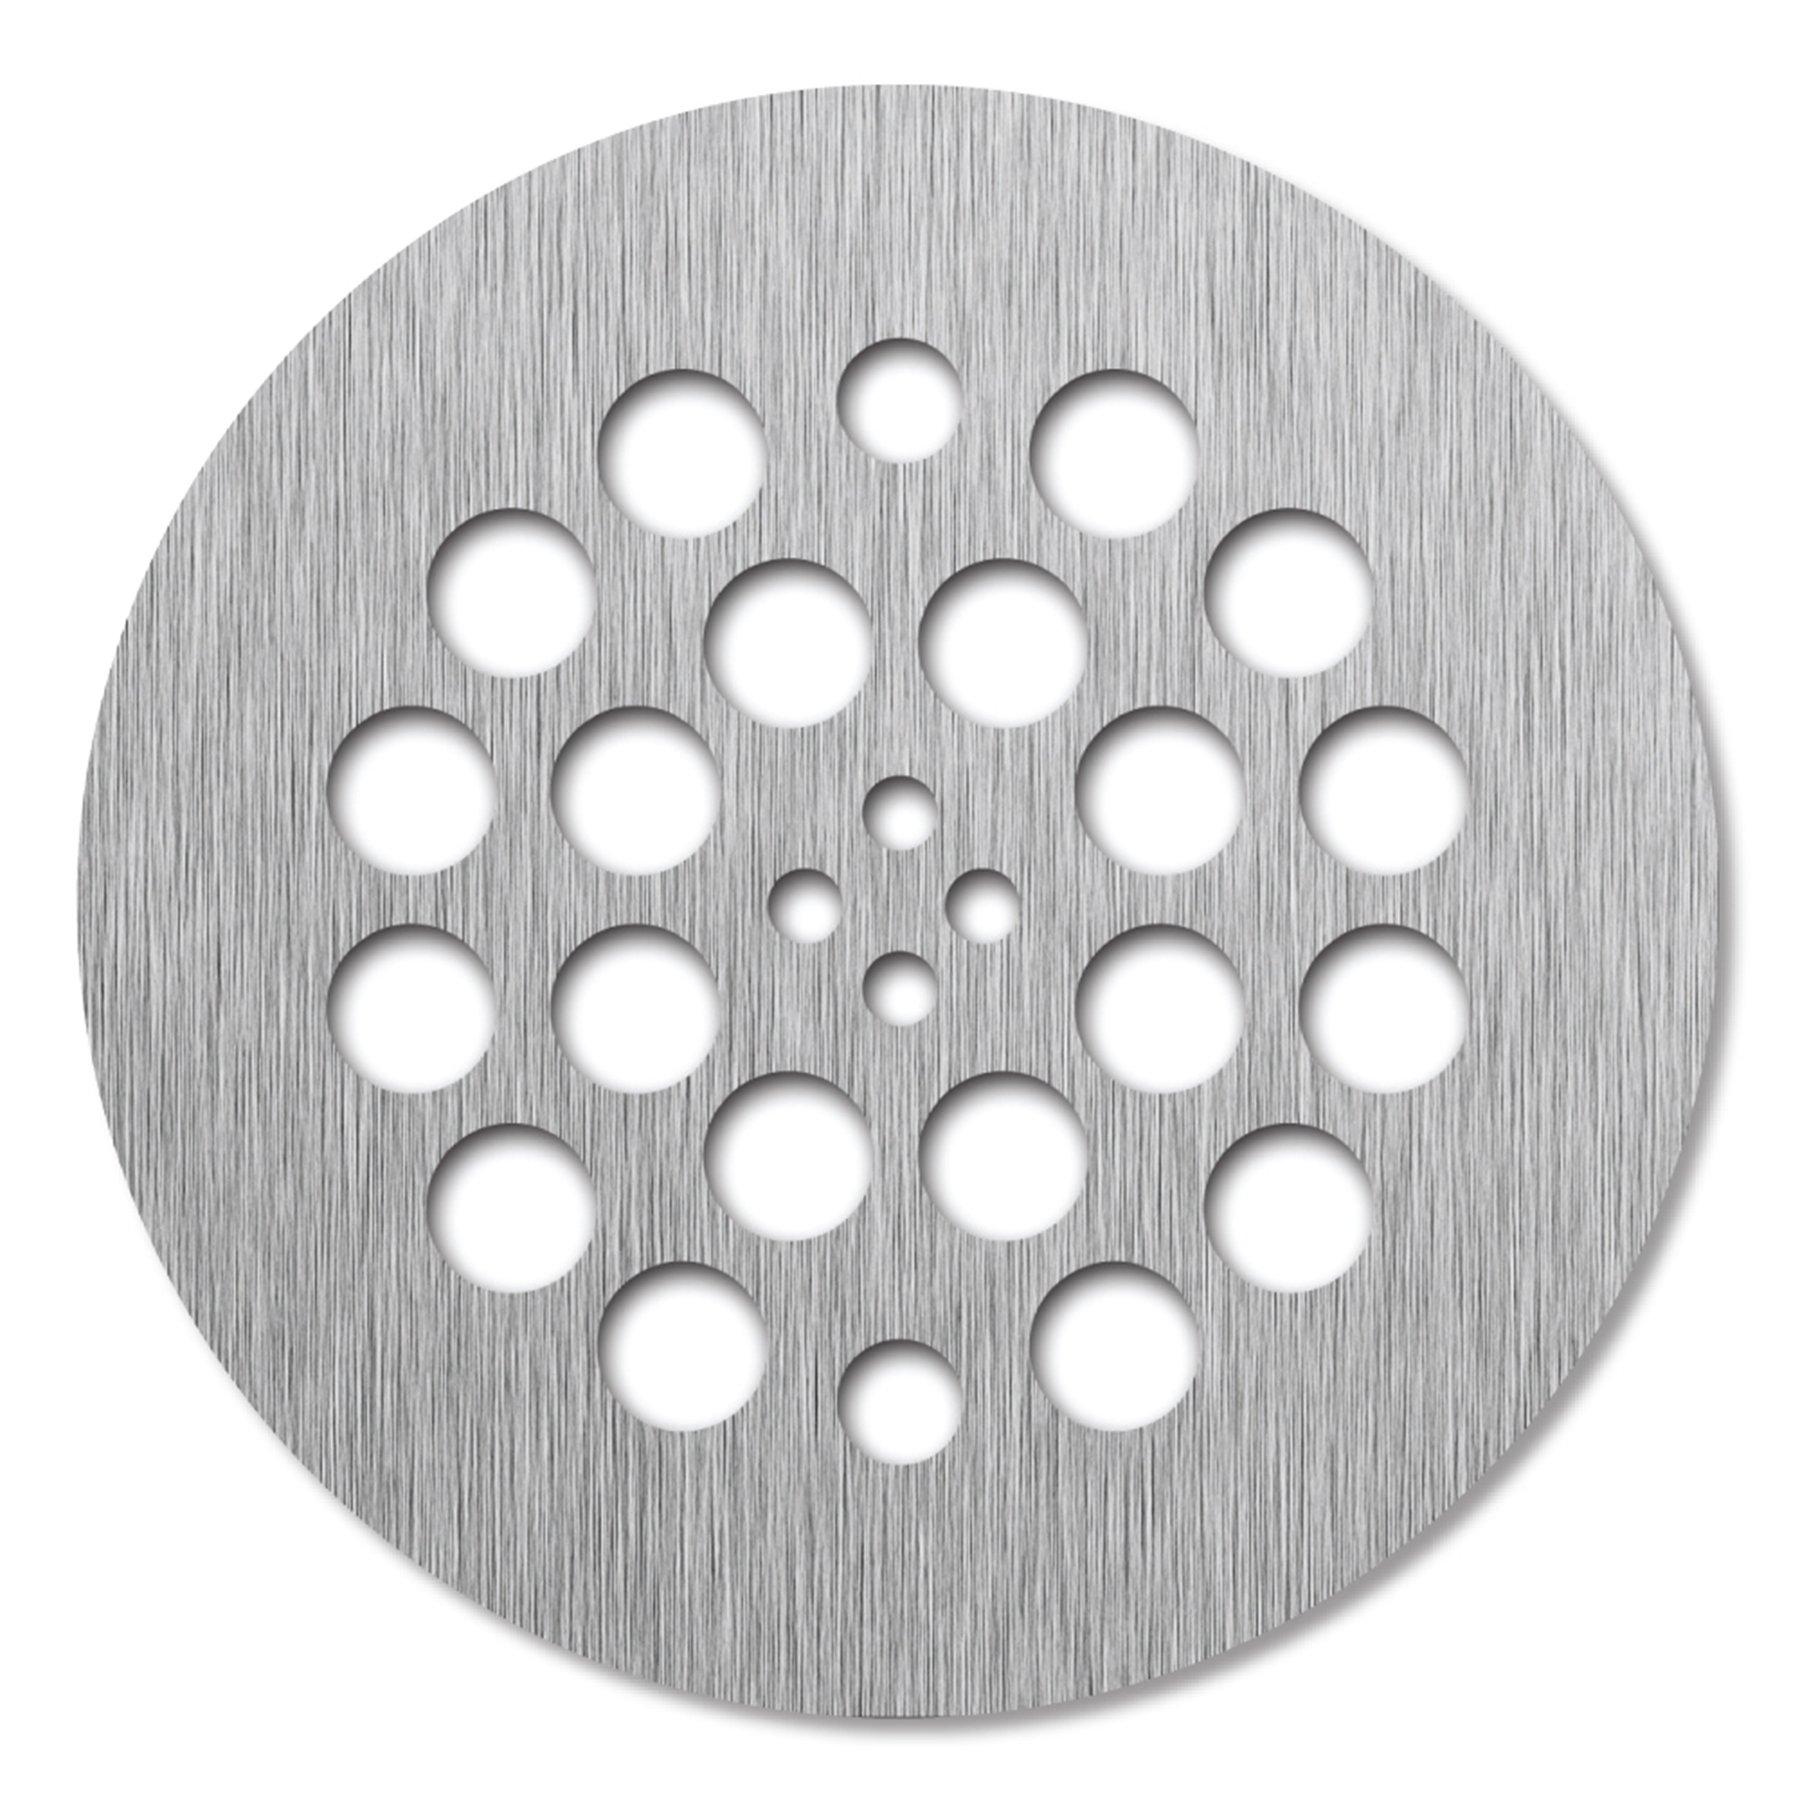 Tile Redi USA DP-RD-BN Drain Shower Drain, 4.25'' D x 4.25'' W, Brushed Nickel by Tile Redi USA